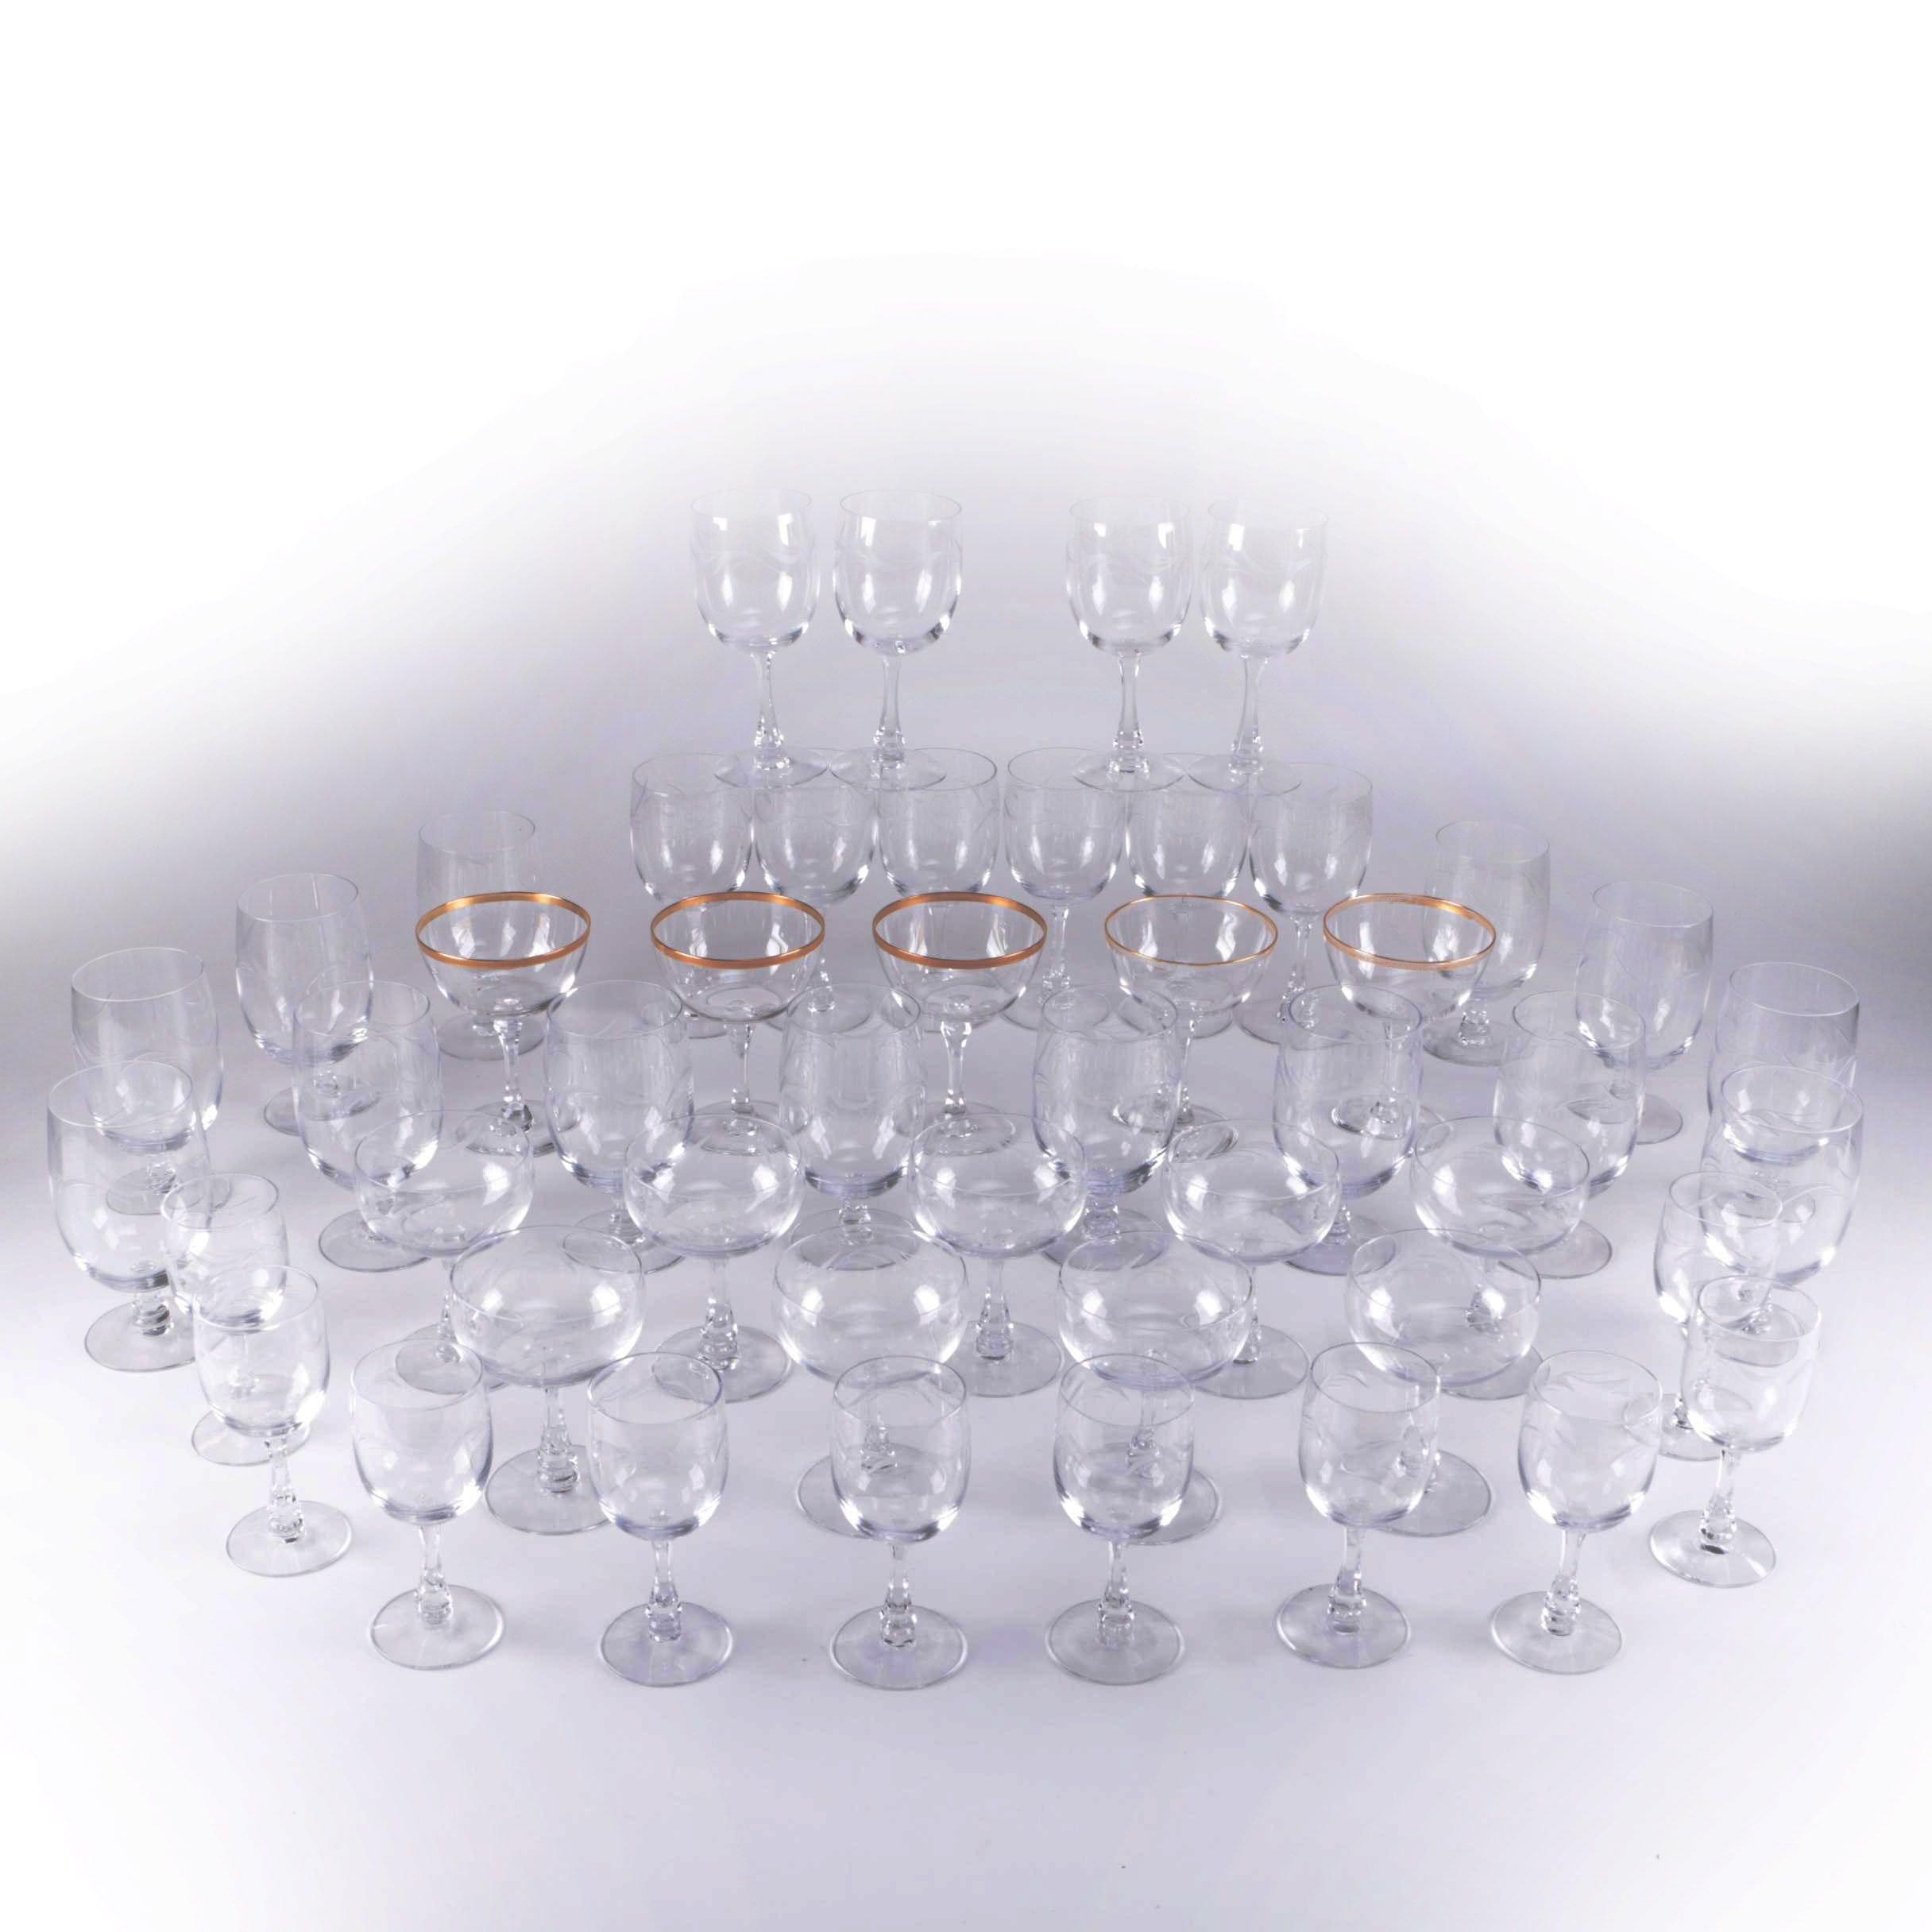 Large Assortment of Glass Stemware